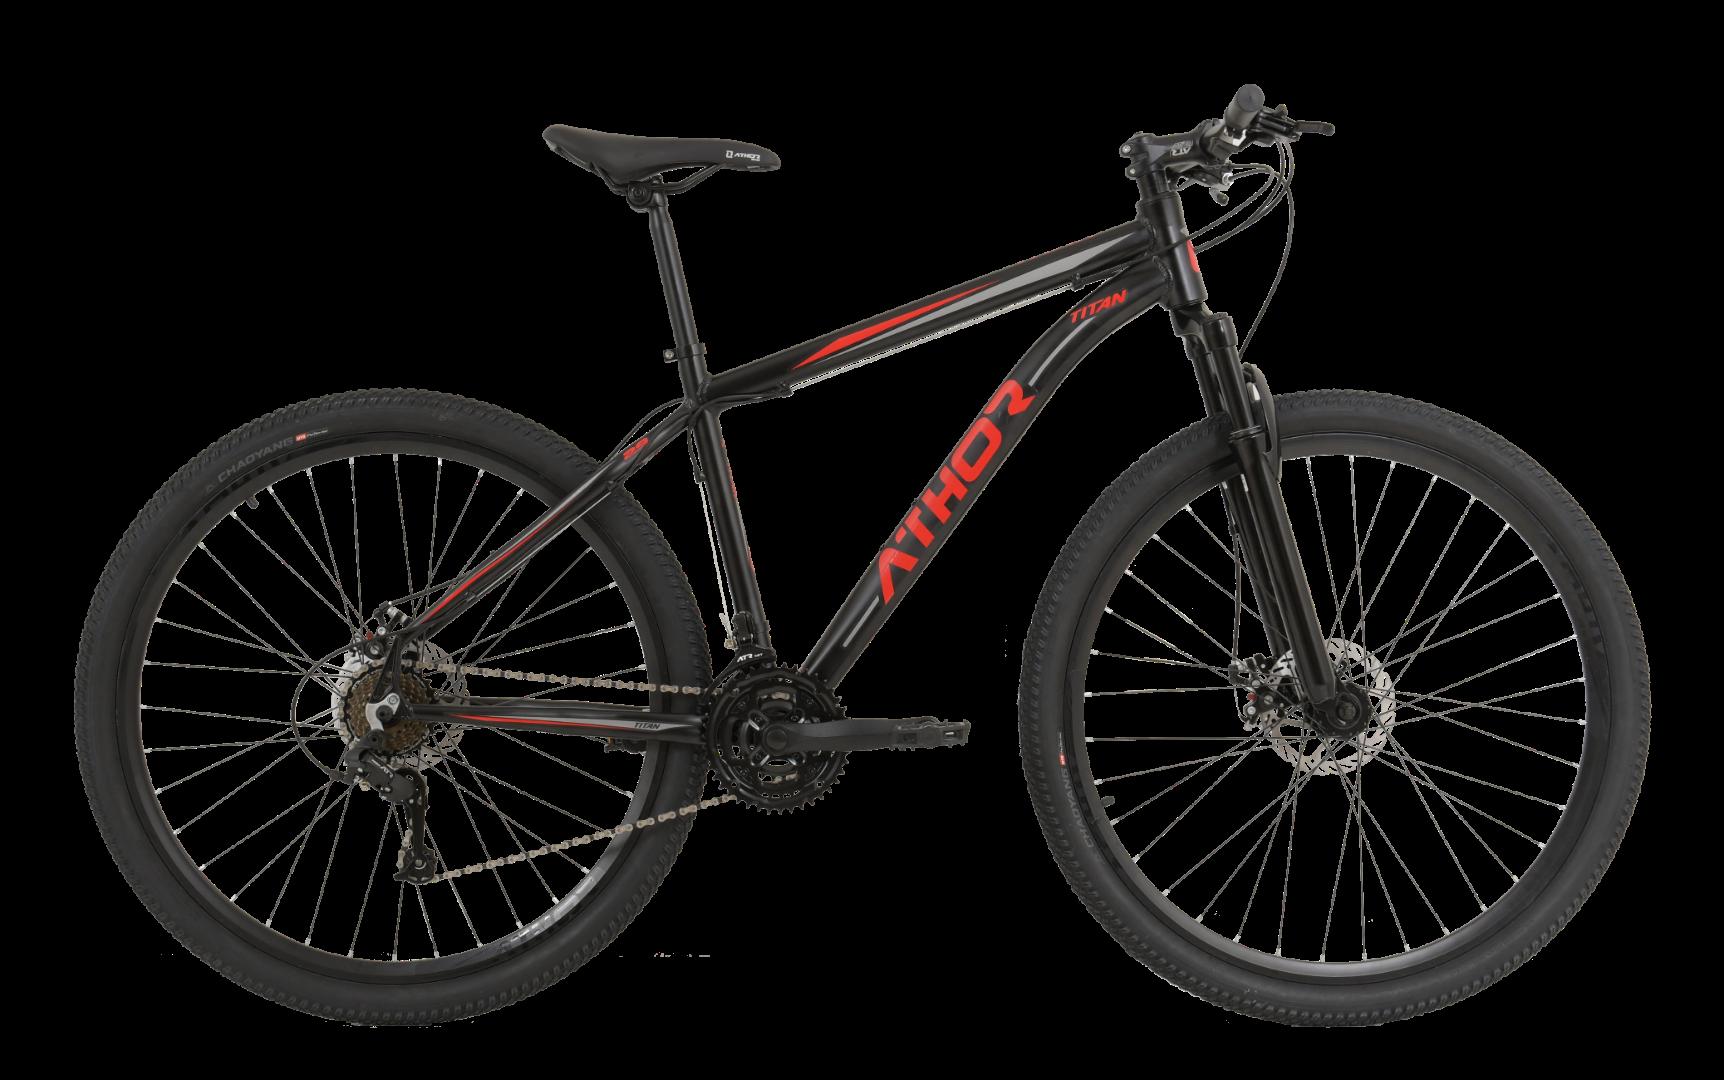 Bicicleta Rider Aro 29 Tam 17 - Athor